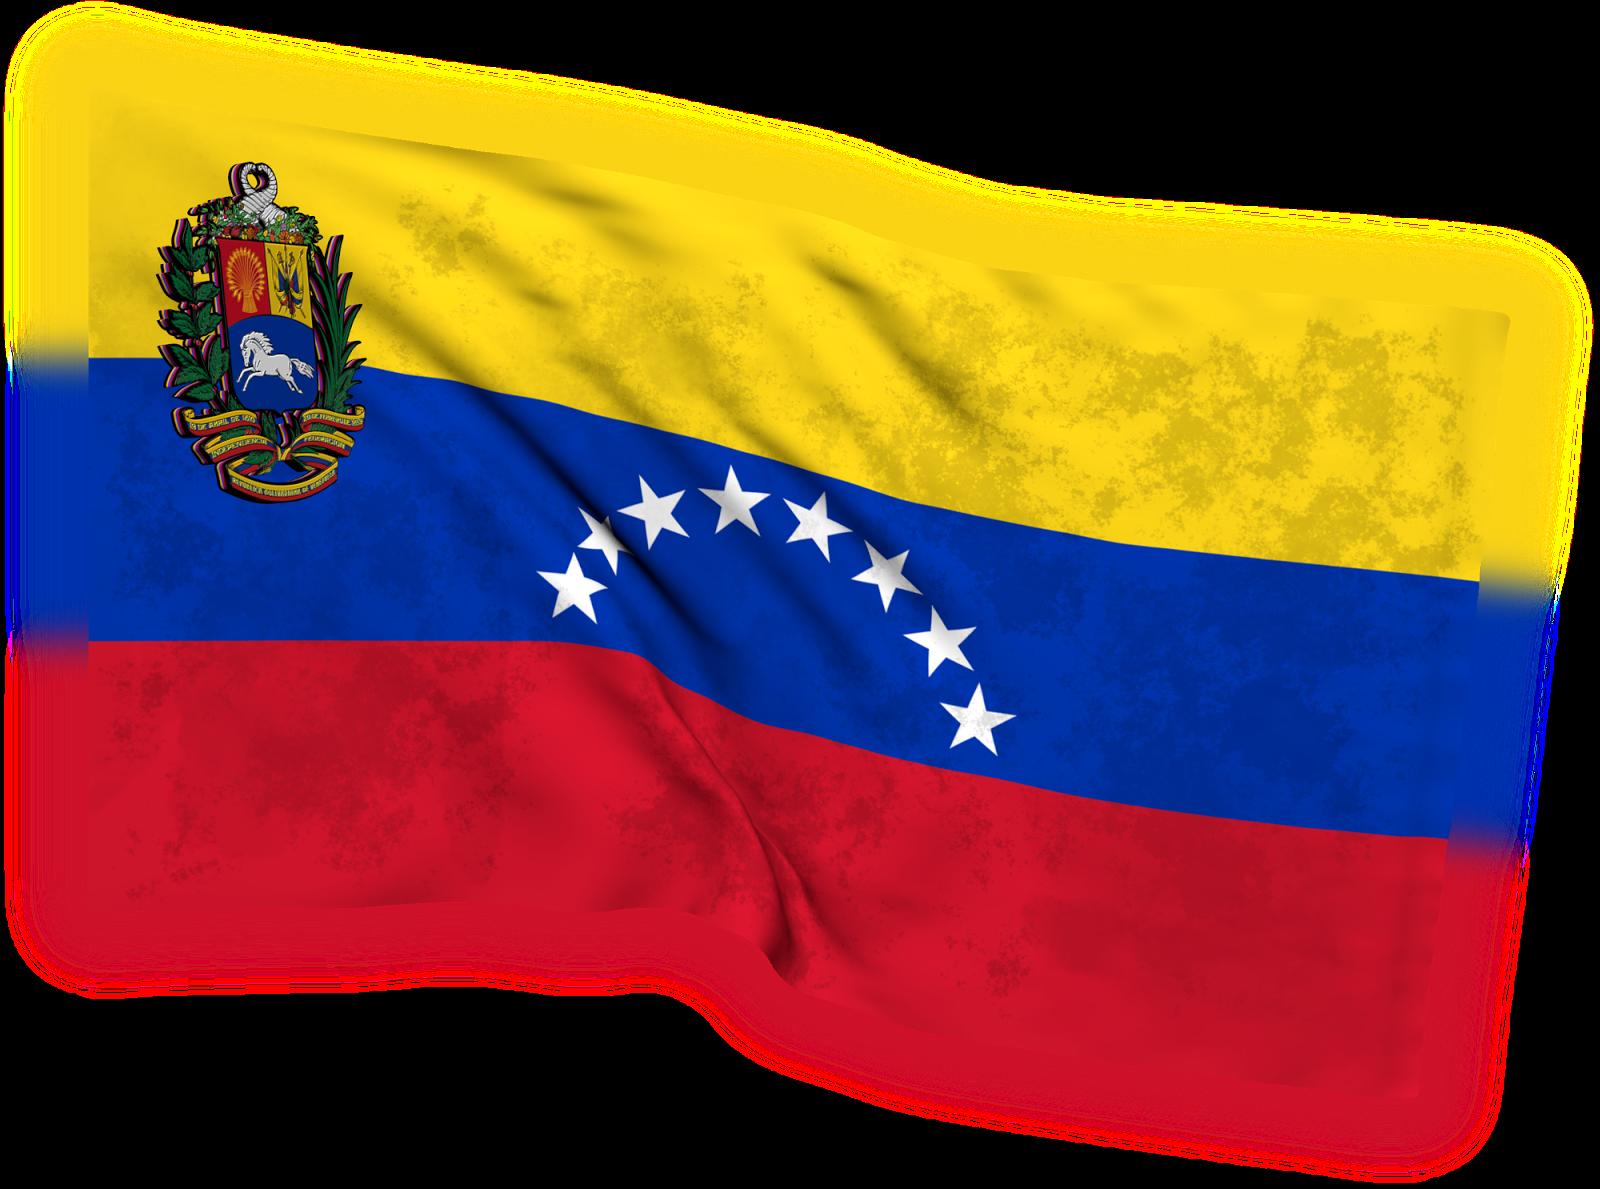 Pin By Jgurbi Urbina On Venezuela Eu Flag Flag Country Flags